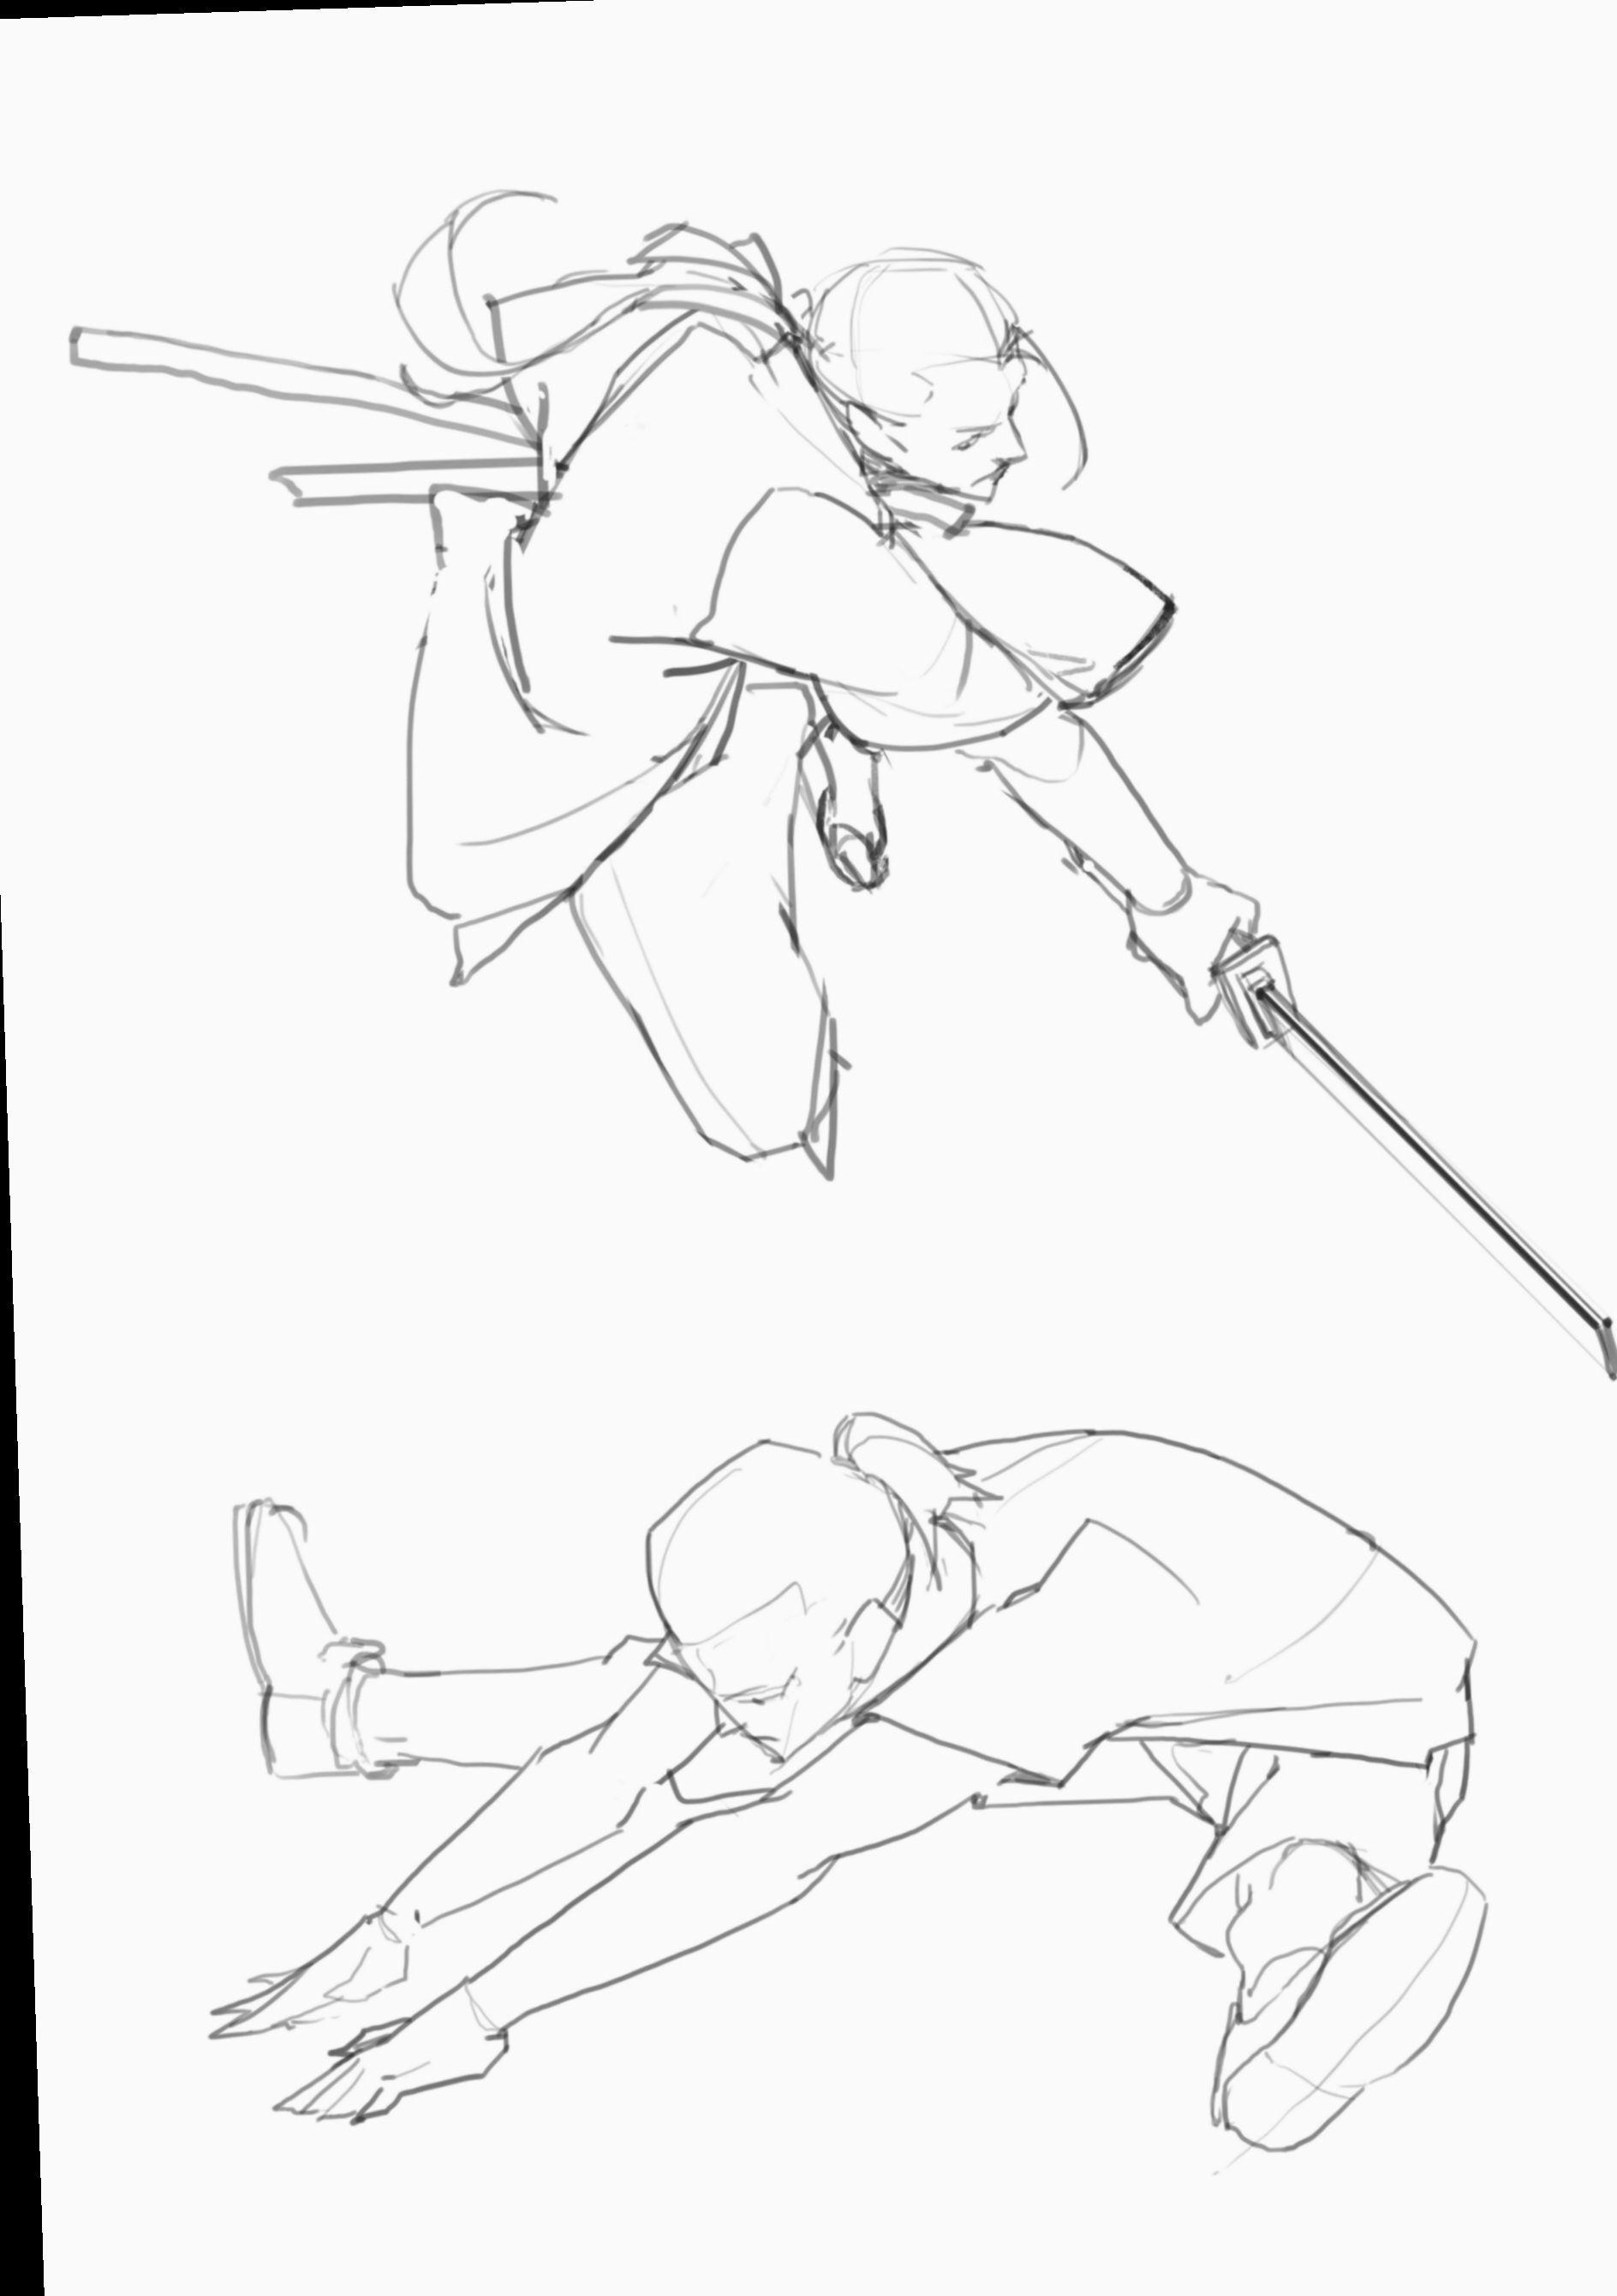 Anime Poses Male Dynamic Katsuki Bakugoucosplay Bakugoukatsukicosplay In 2020 Drawing Poses Male Anime Poses Reference Figure Drawing Reference